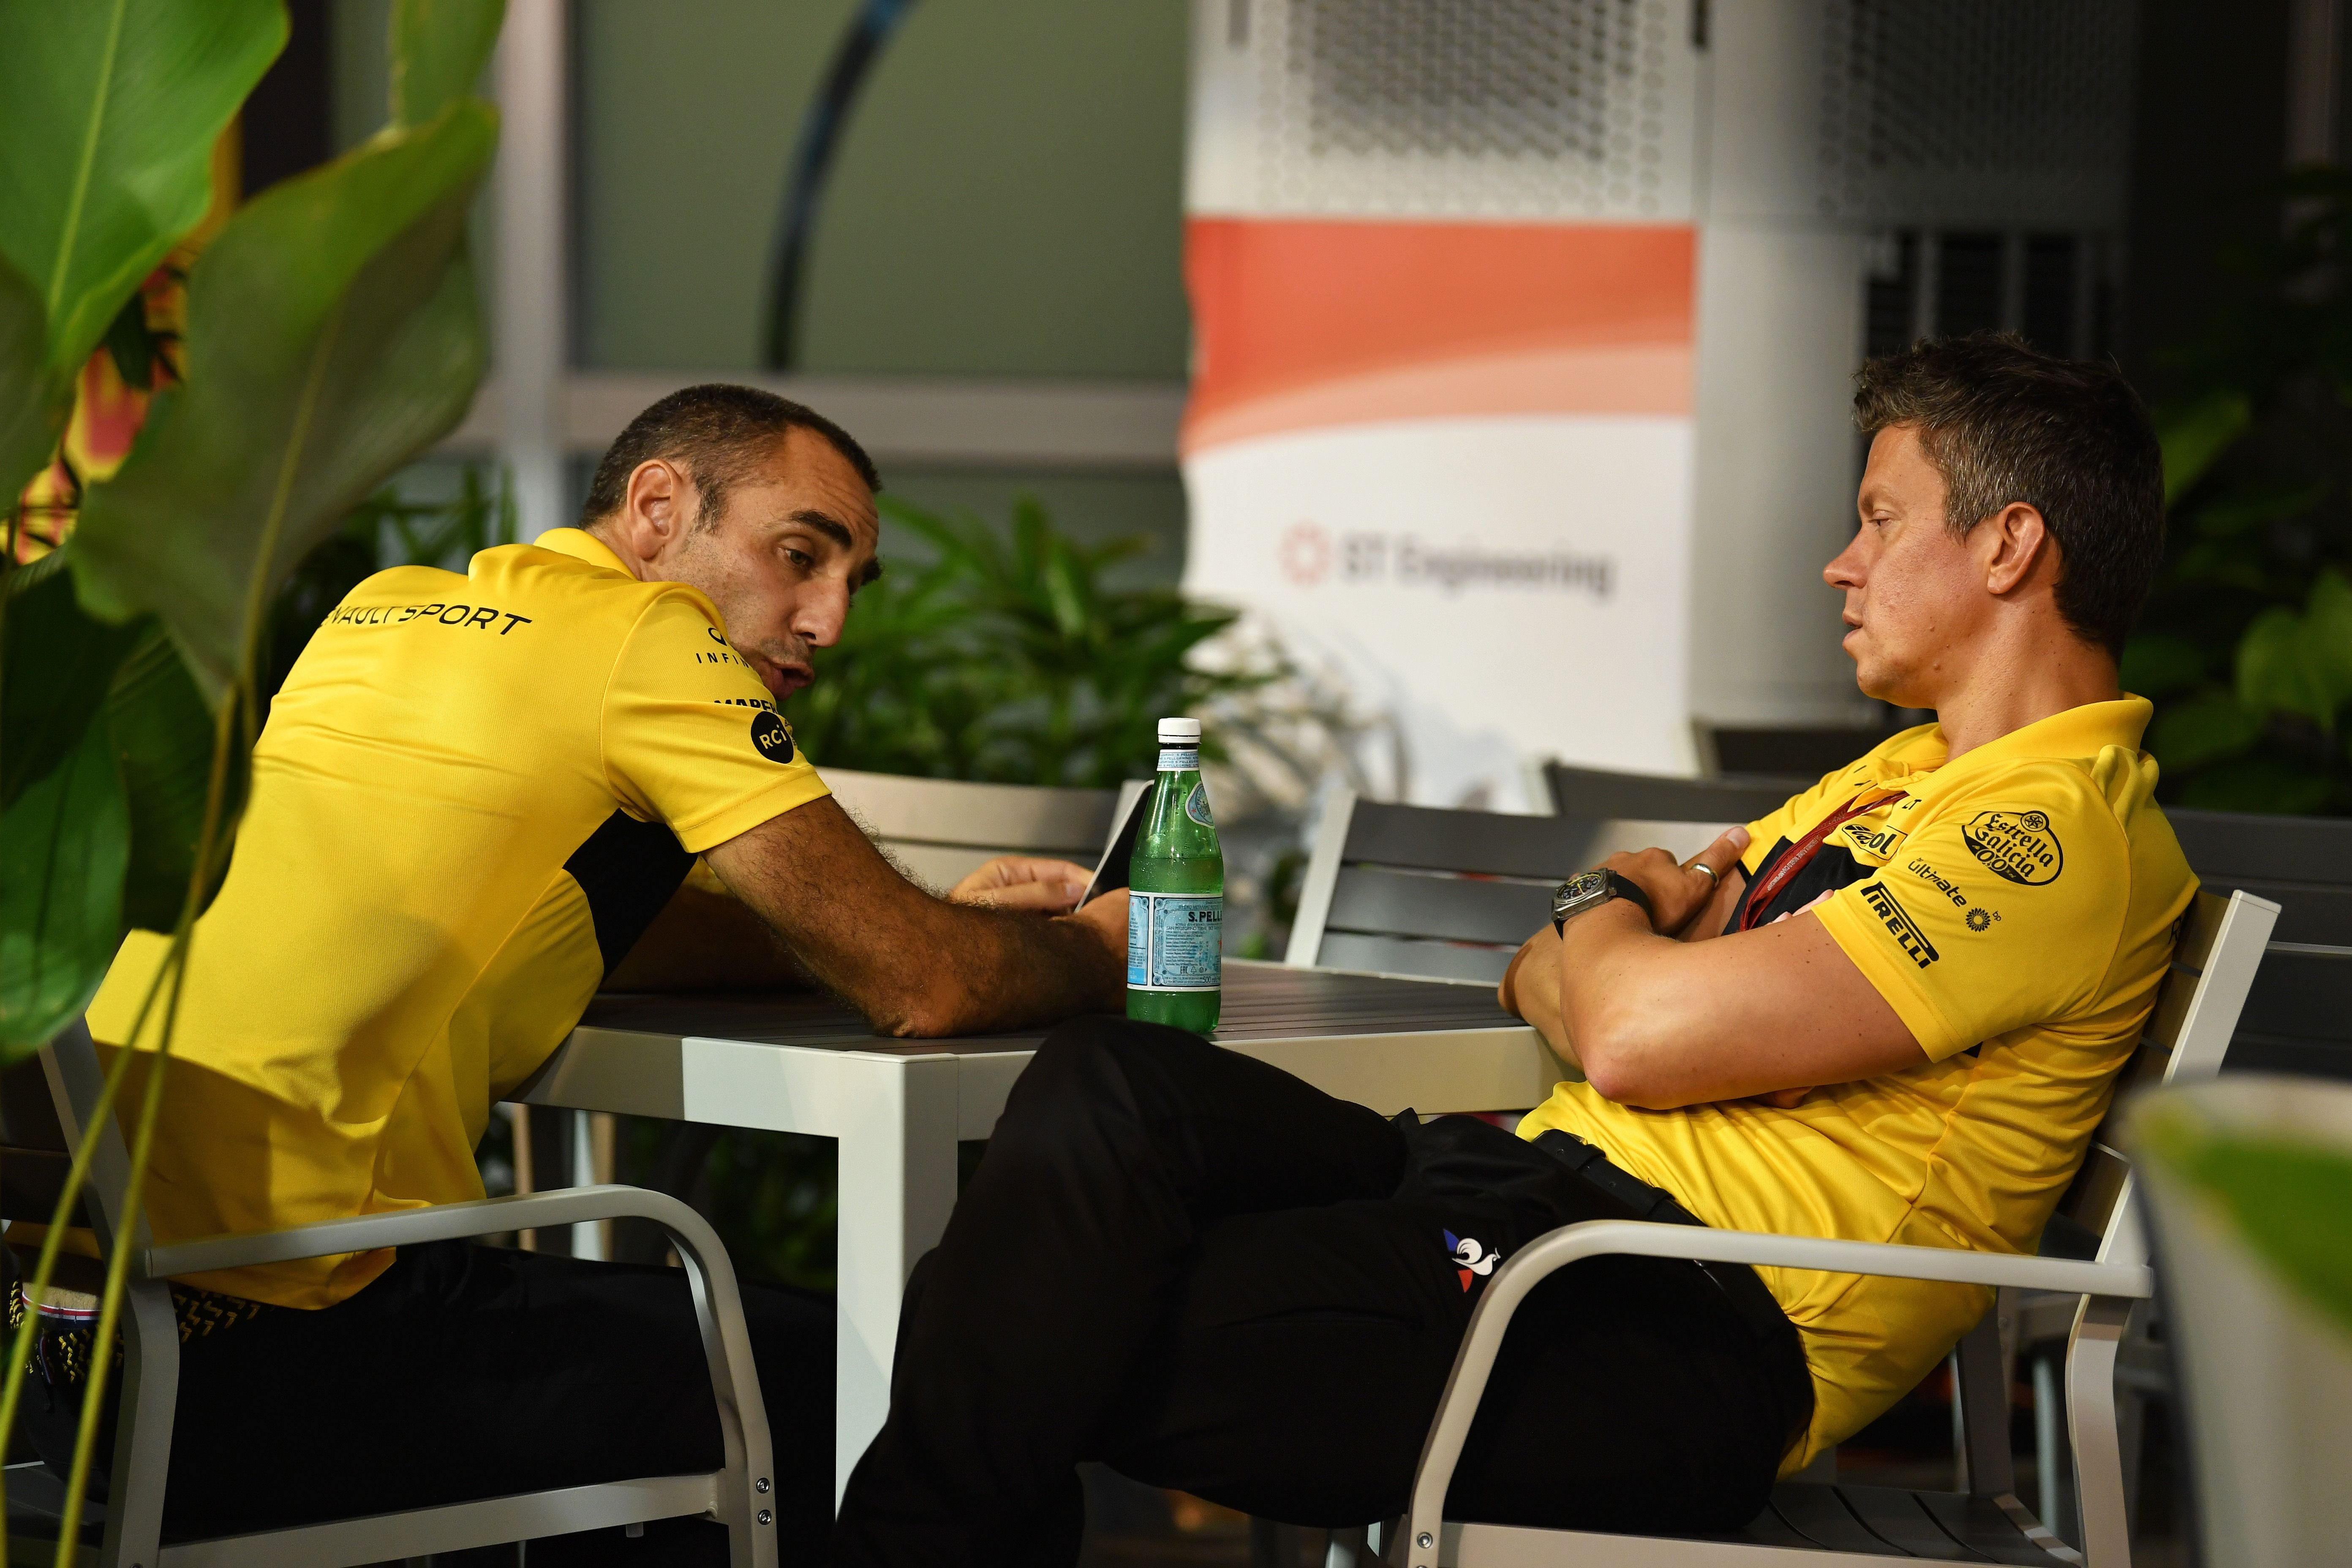 Abiteboul and Budkowski Renault F1 team 2018